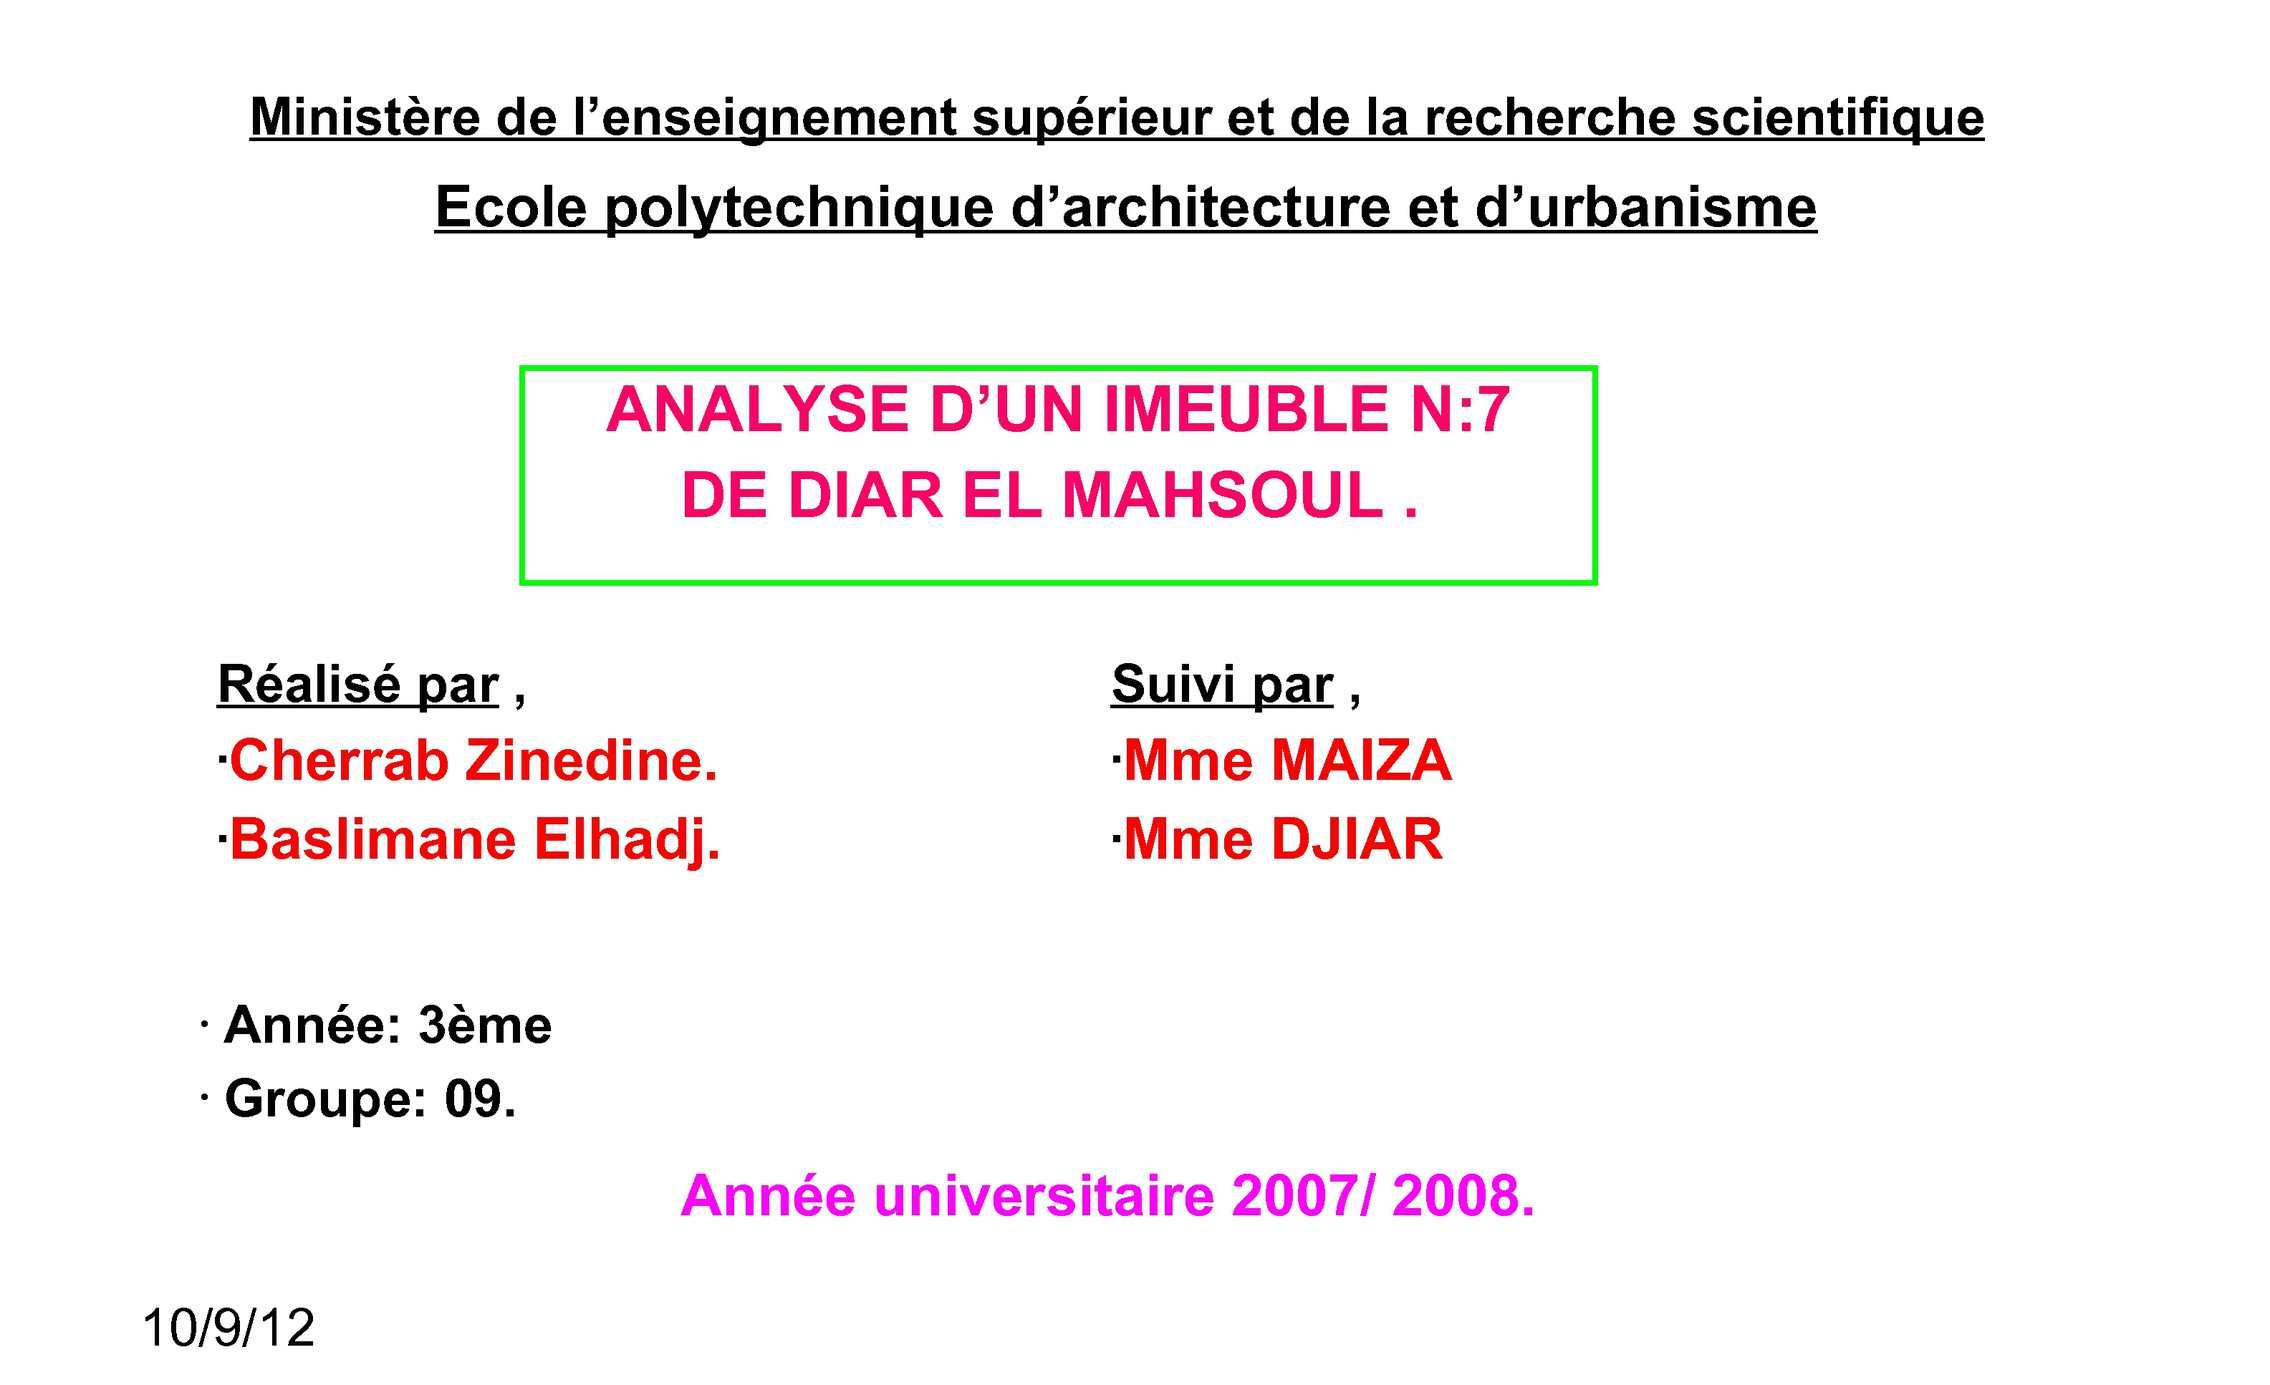 Cherrab & Basliman Dyar El Mahçoul